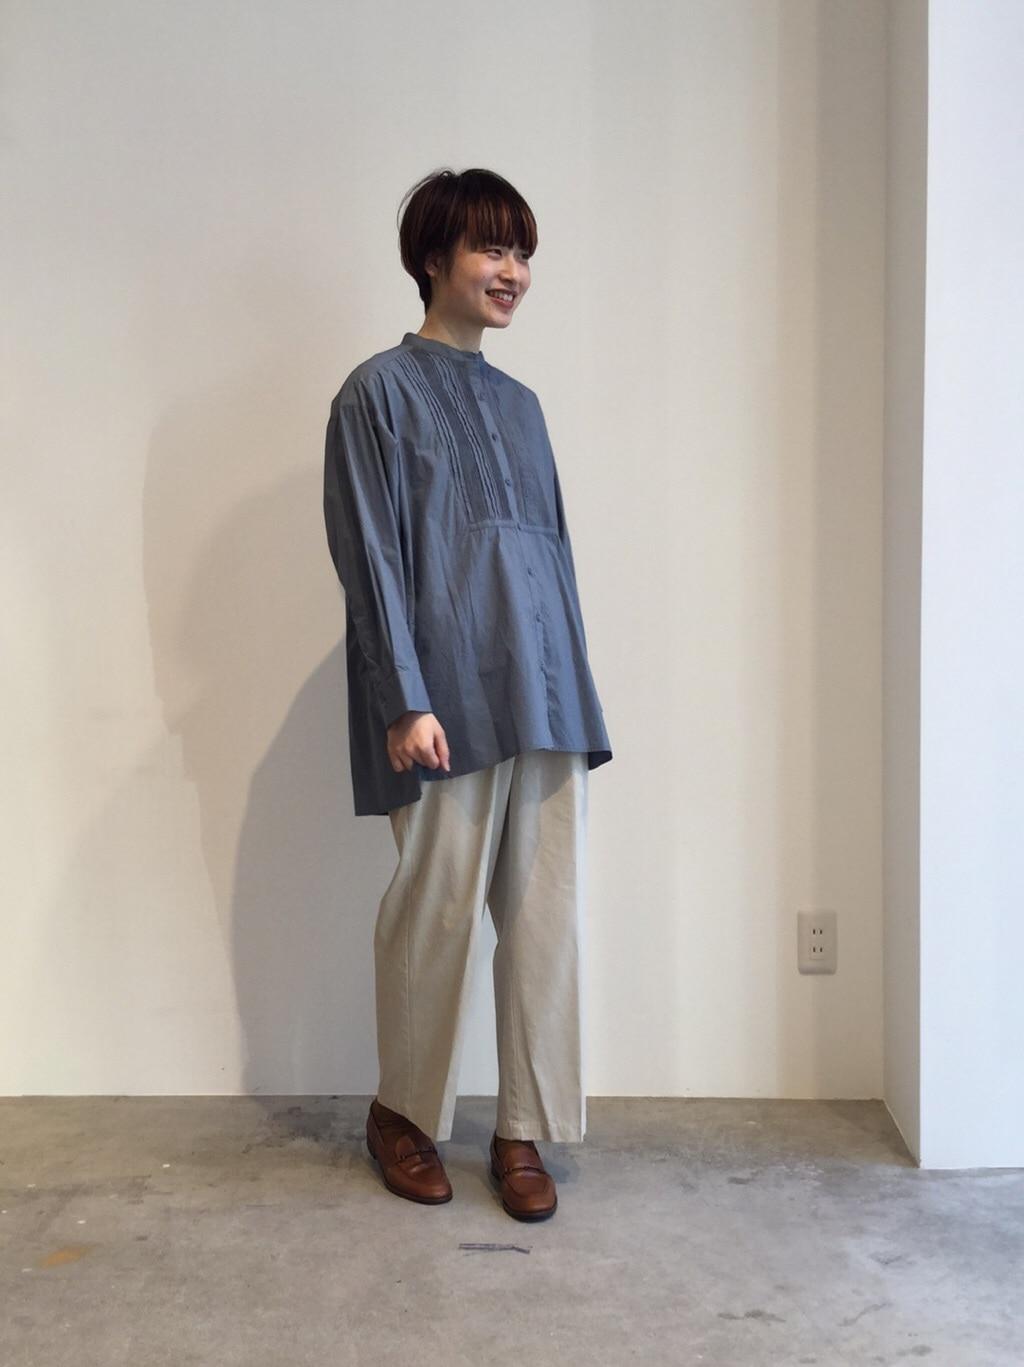 yuni 名古屋栄路面 身長:162cm 2019.12.16